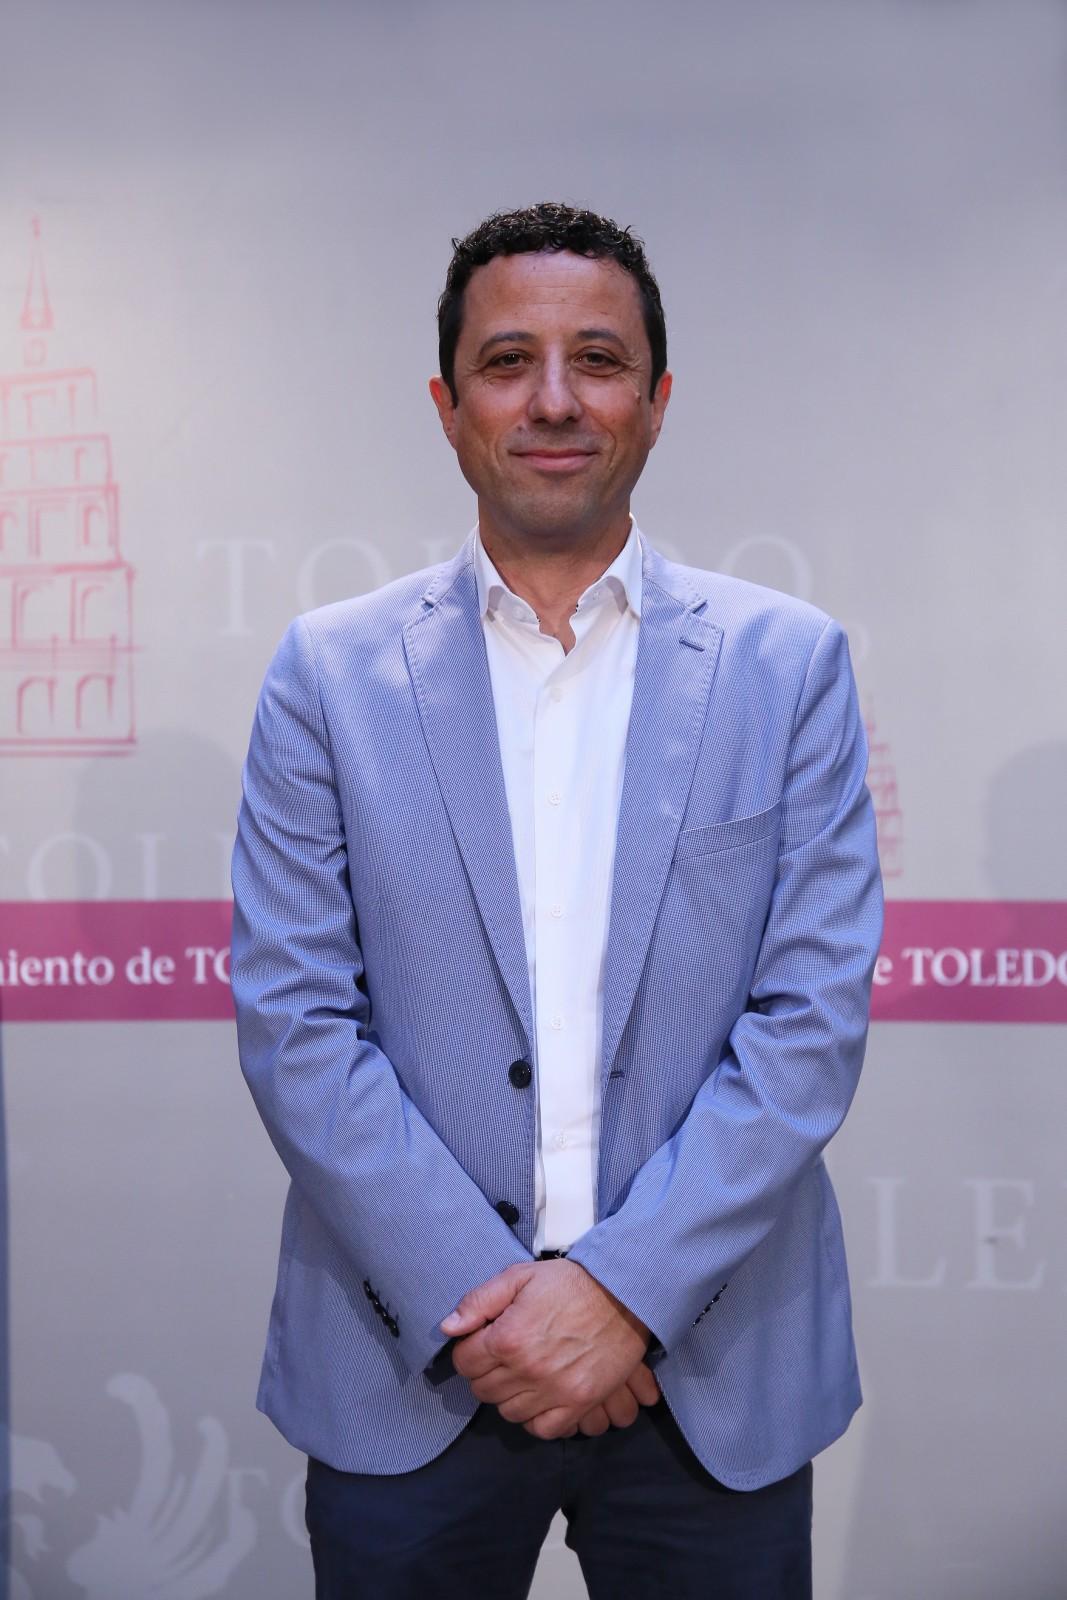 Francisco Armenta Menéndez